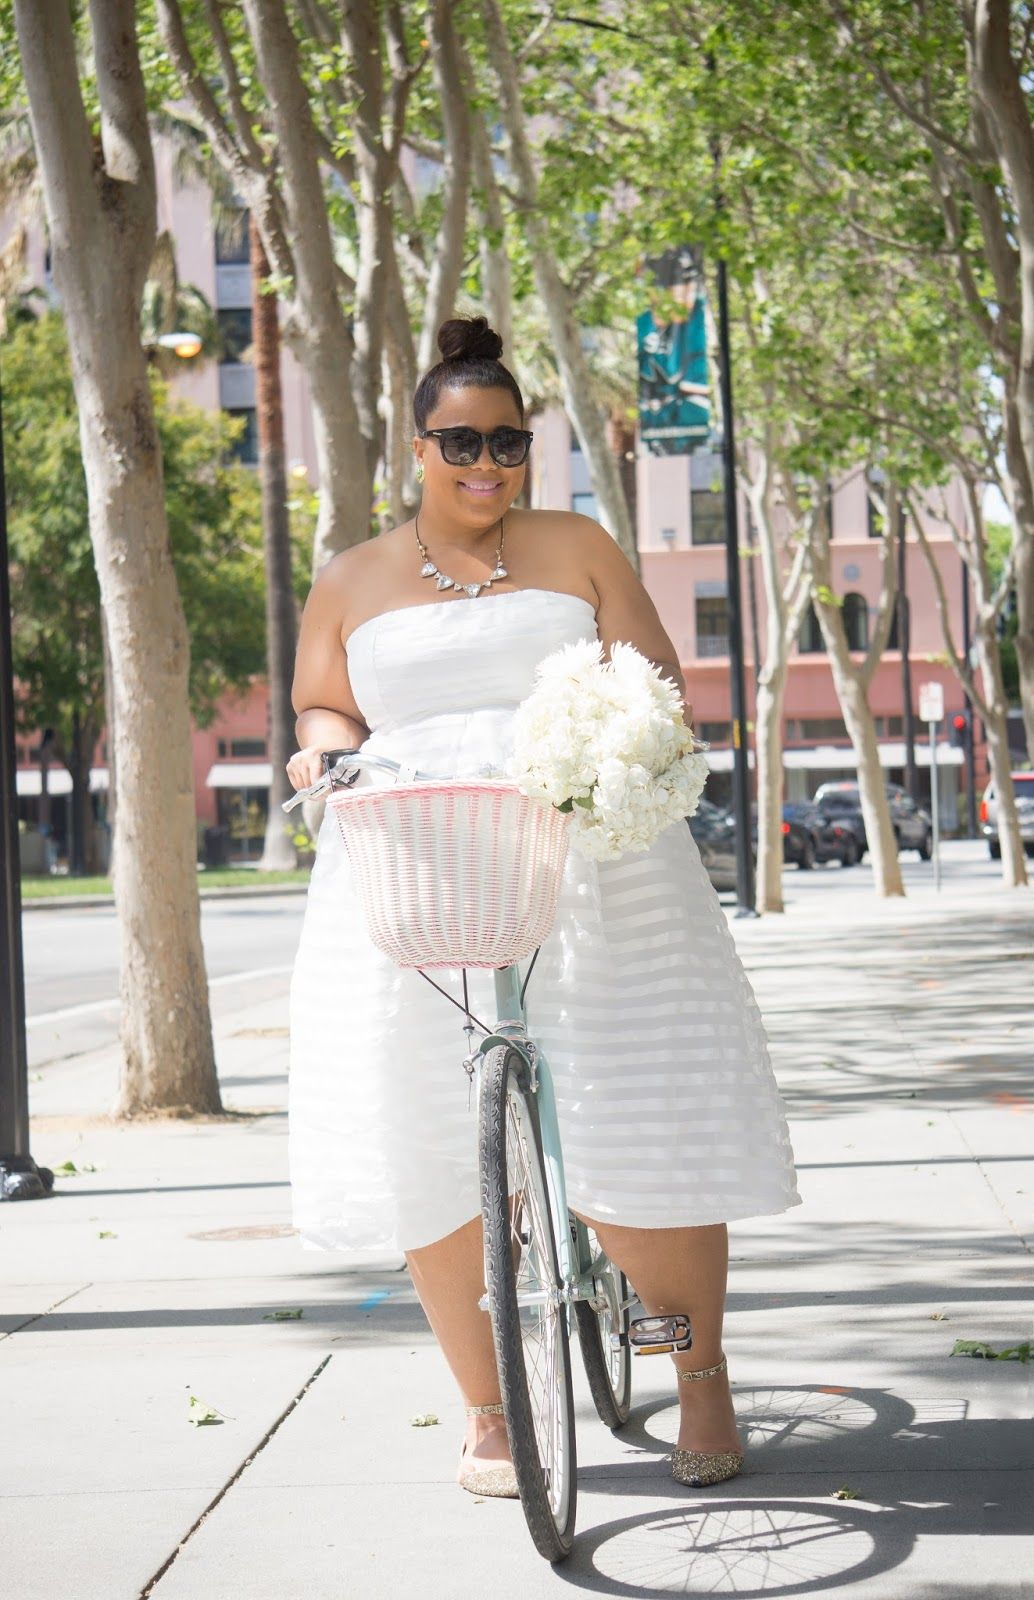 Bbw models on street bikes